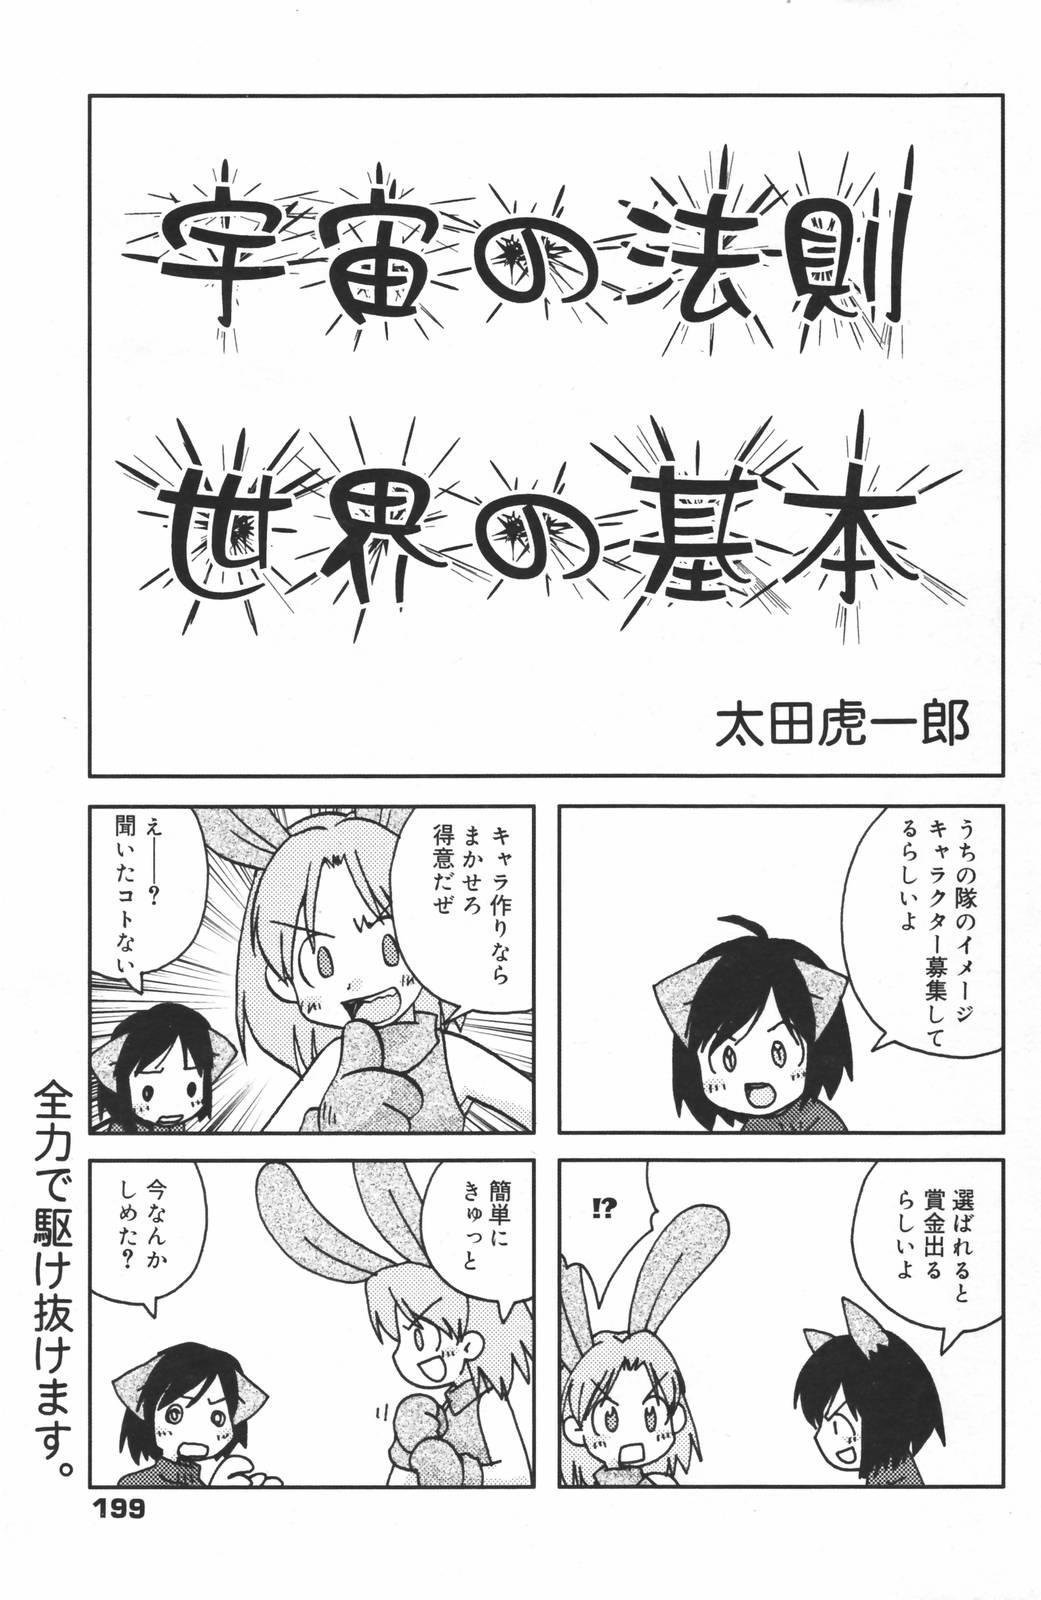 Manga Bangaichi 2007-03 198